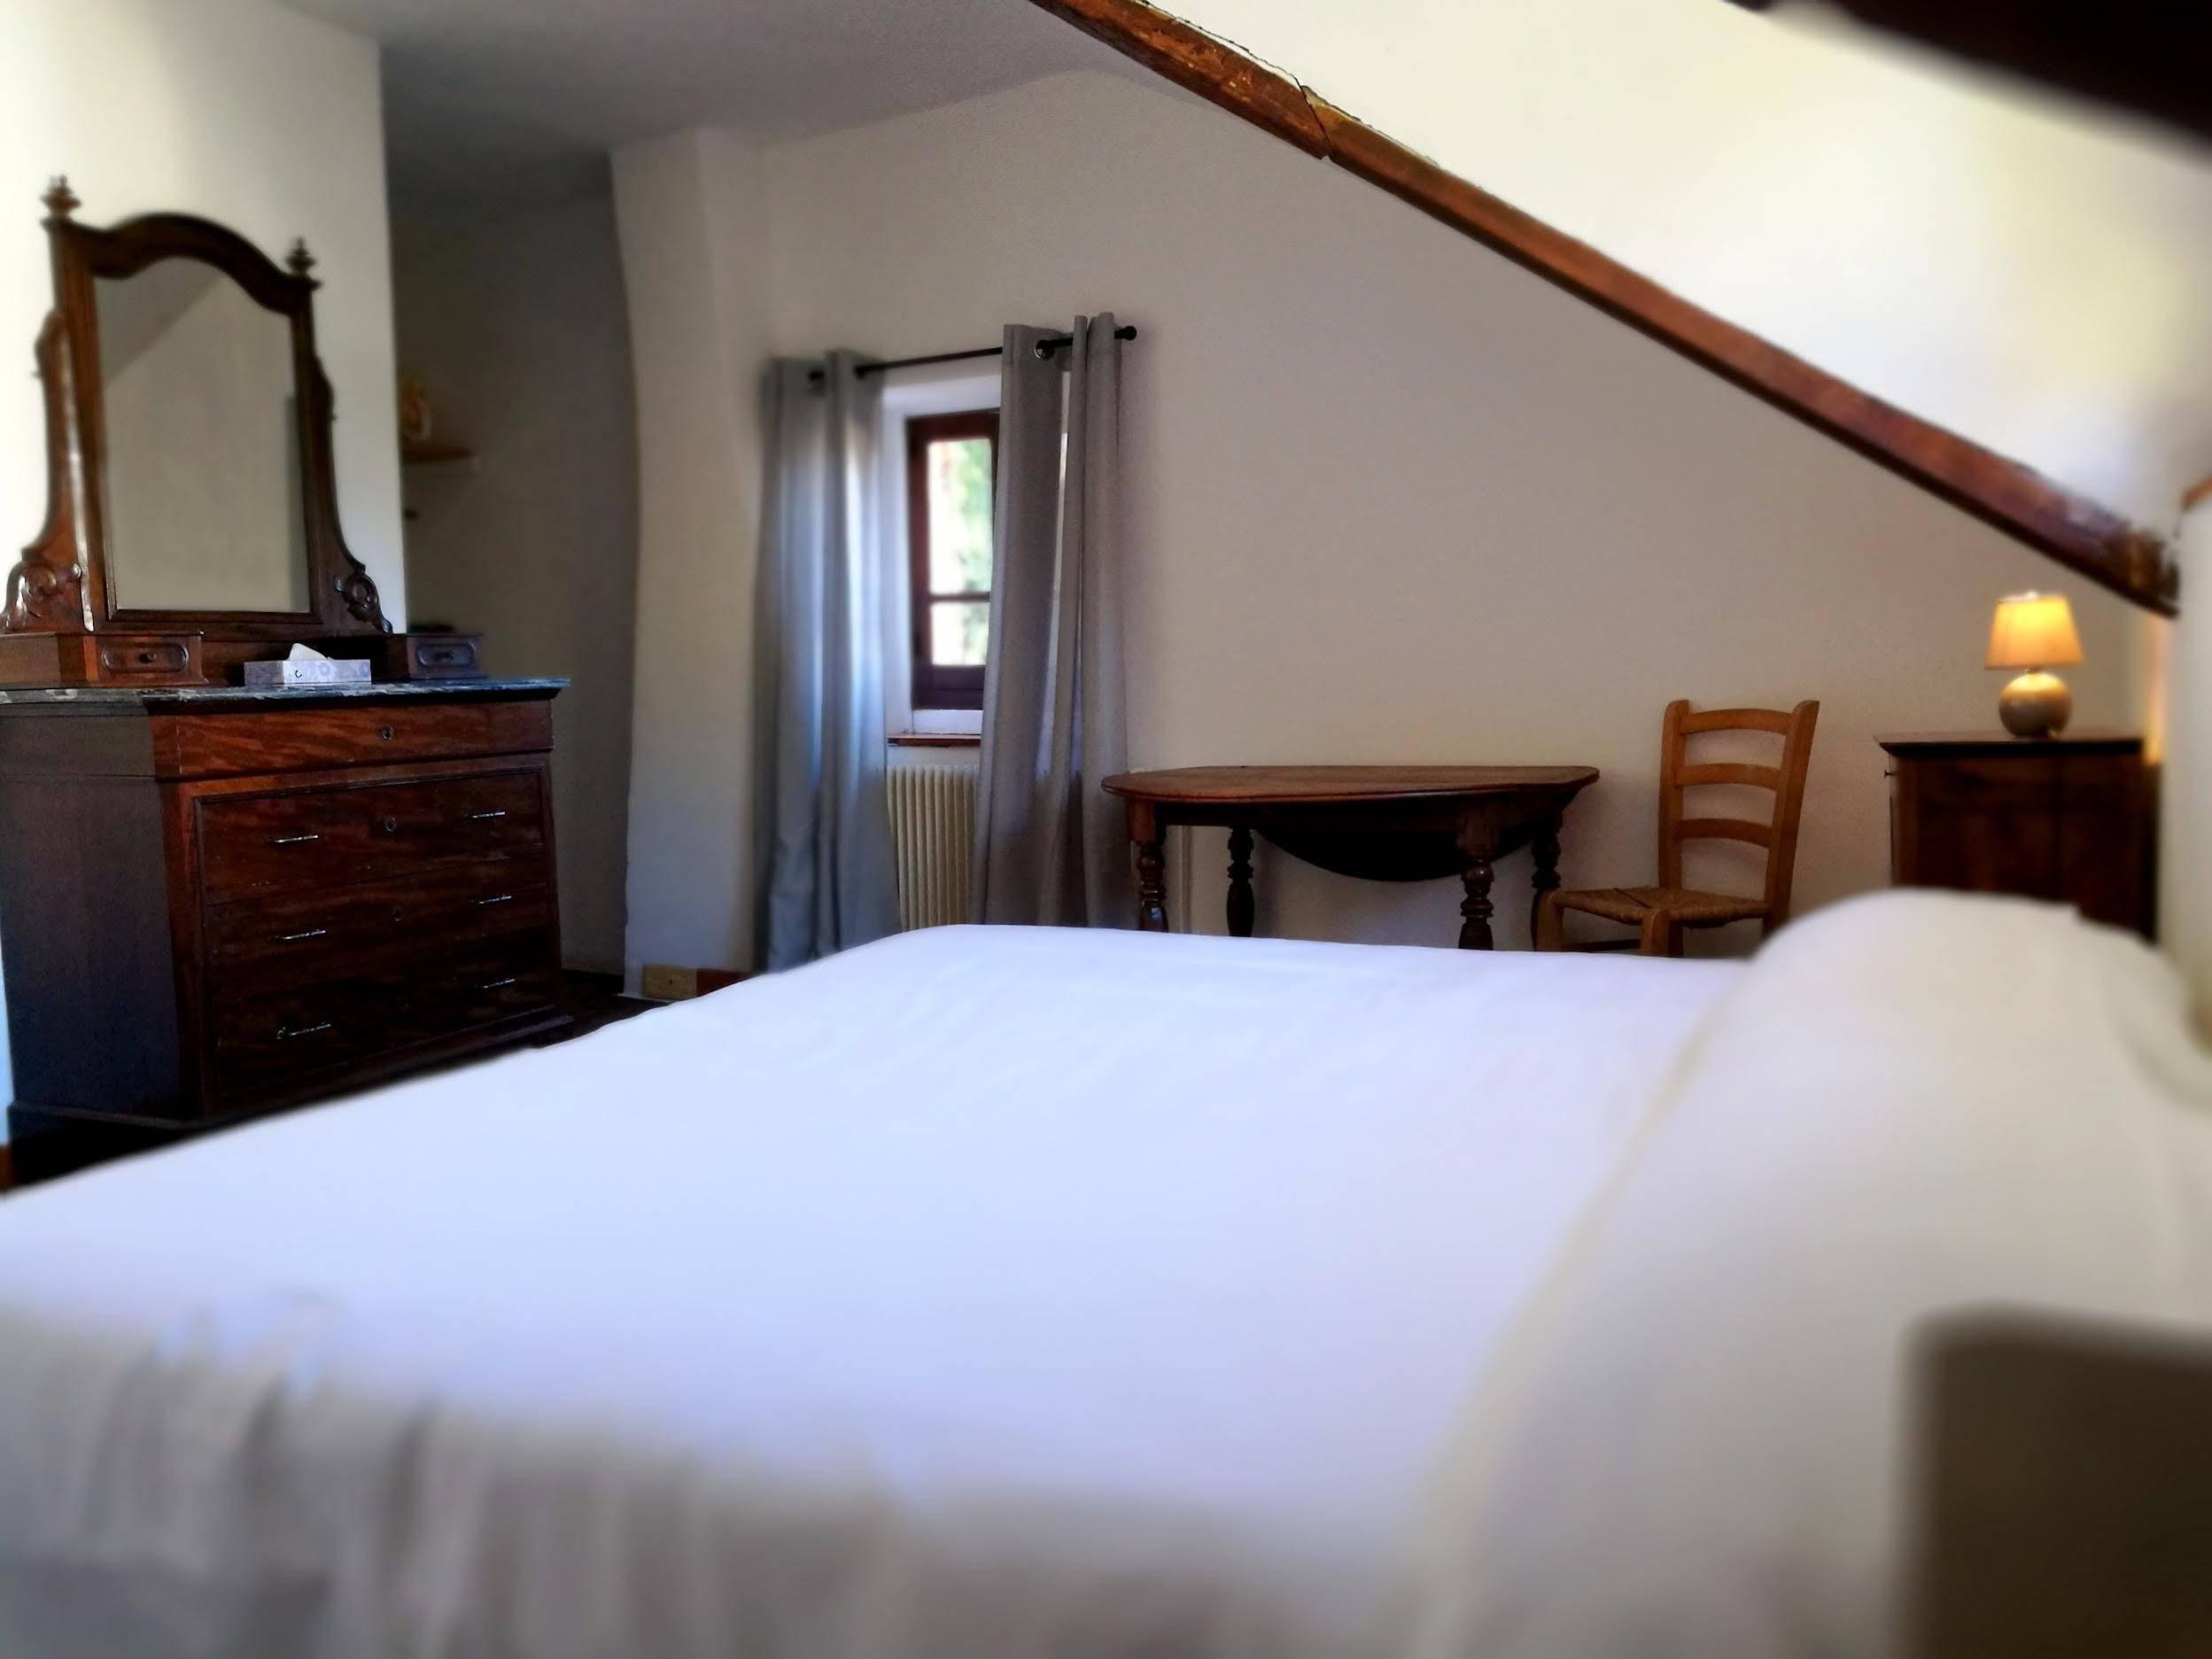 Hotel Logis - Chateau de Beauregard